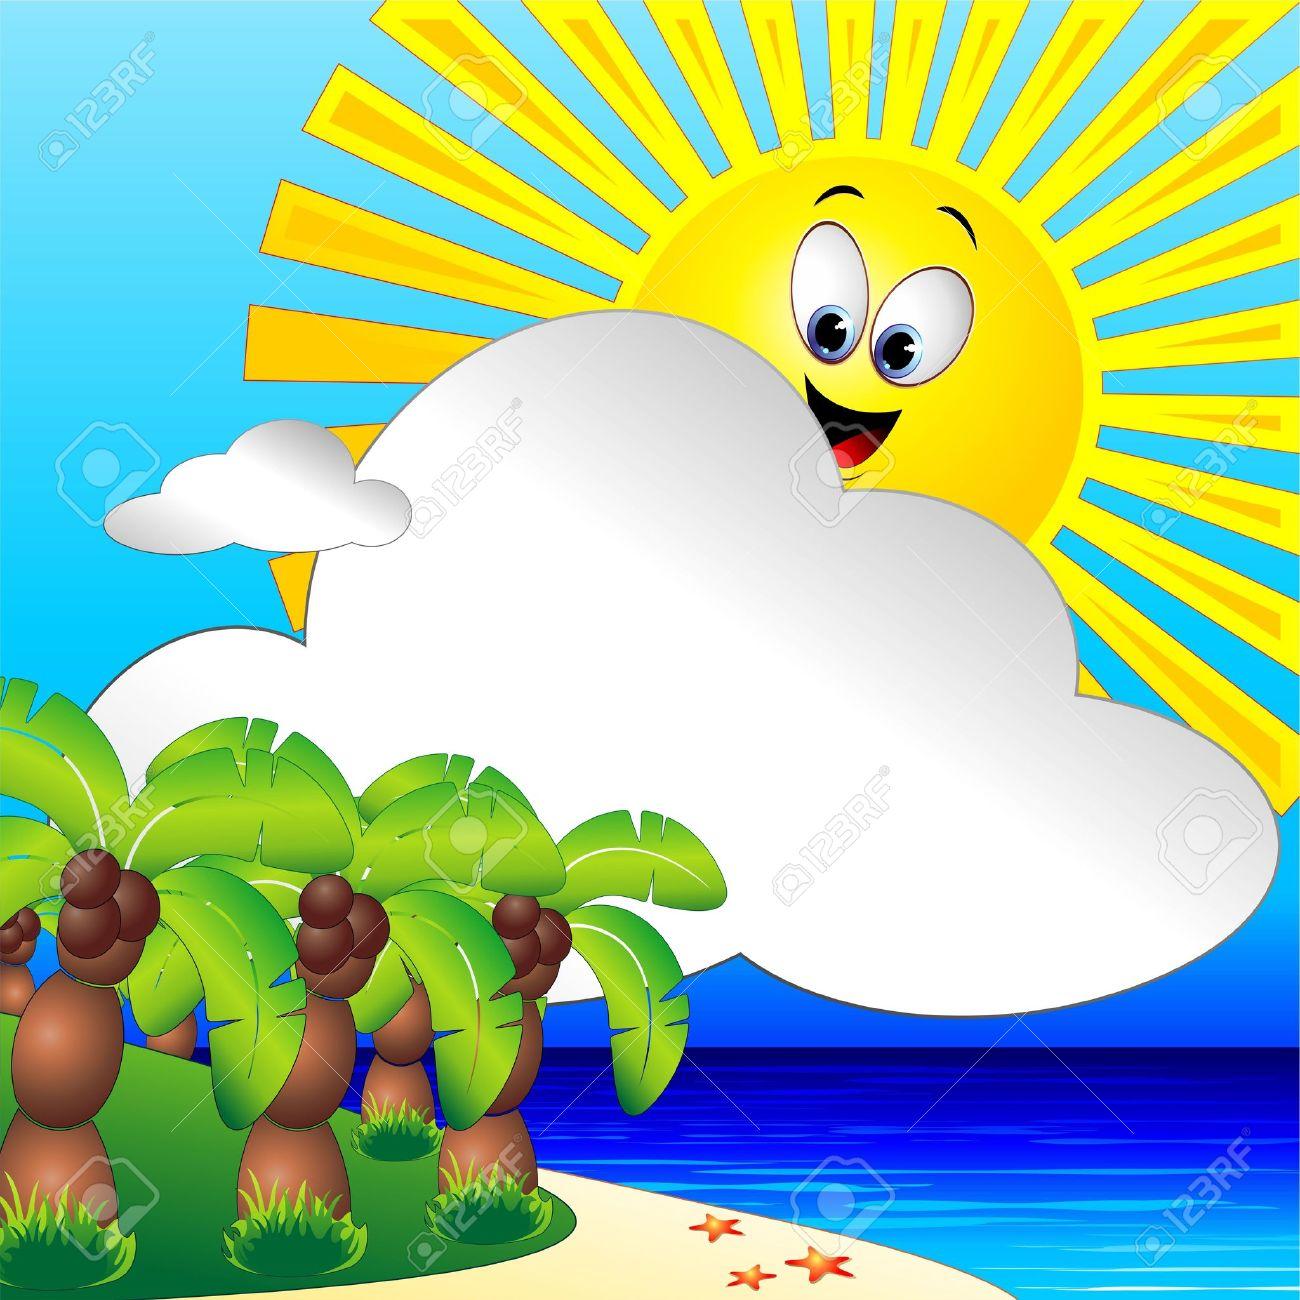 Summer Holidays Tropical Beach and Palm Trees Clip Art.